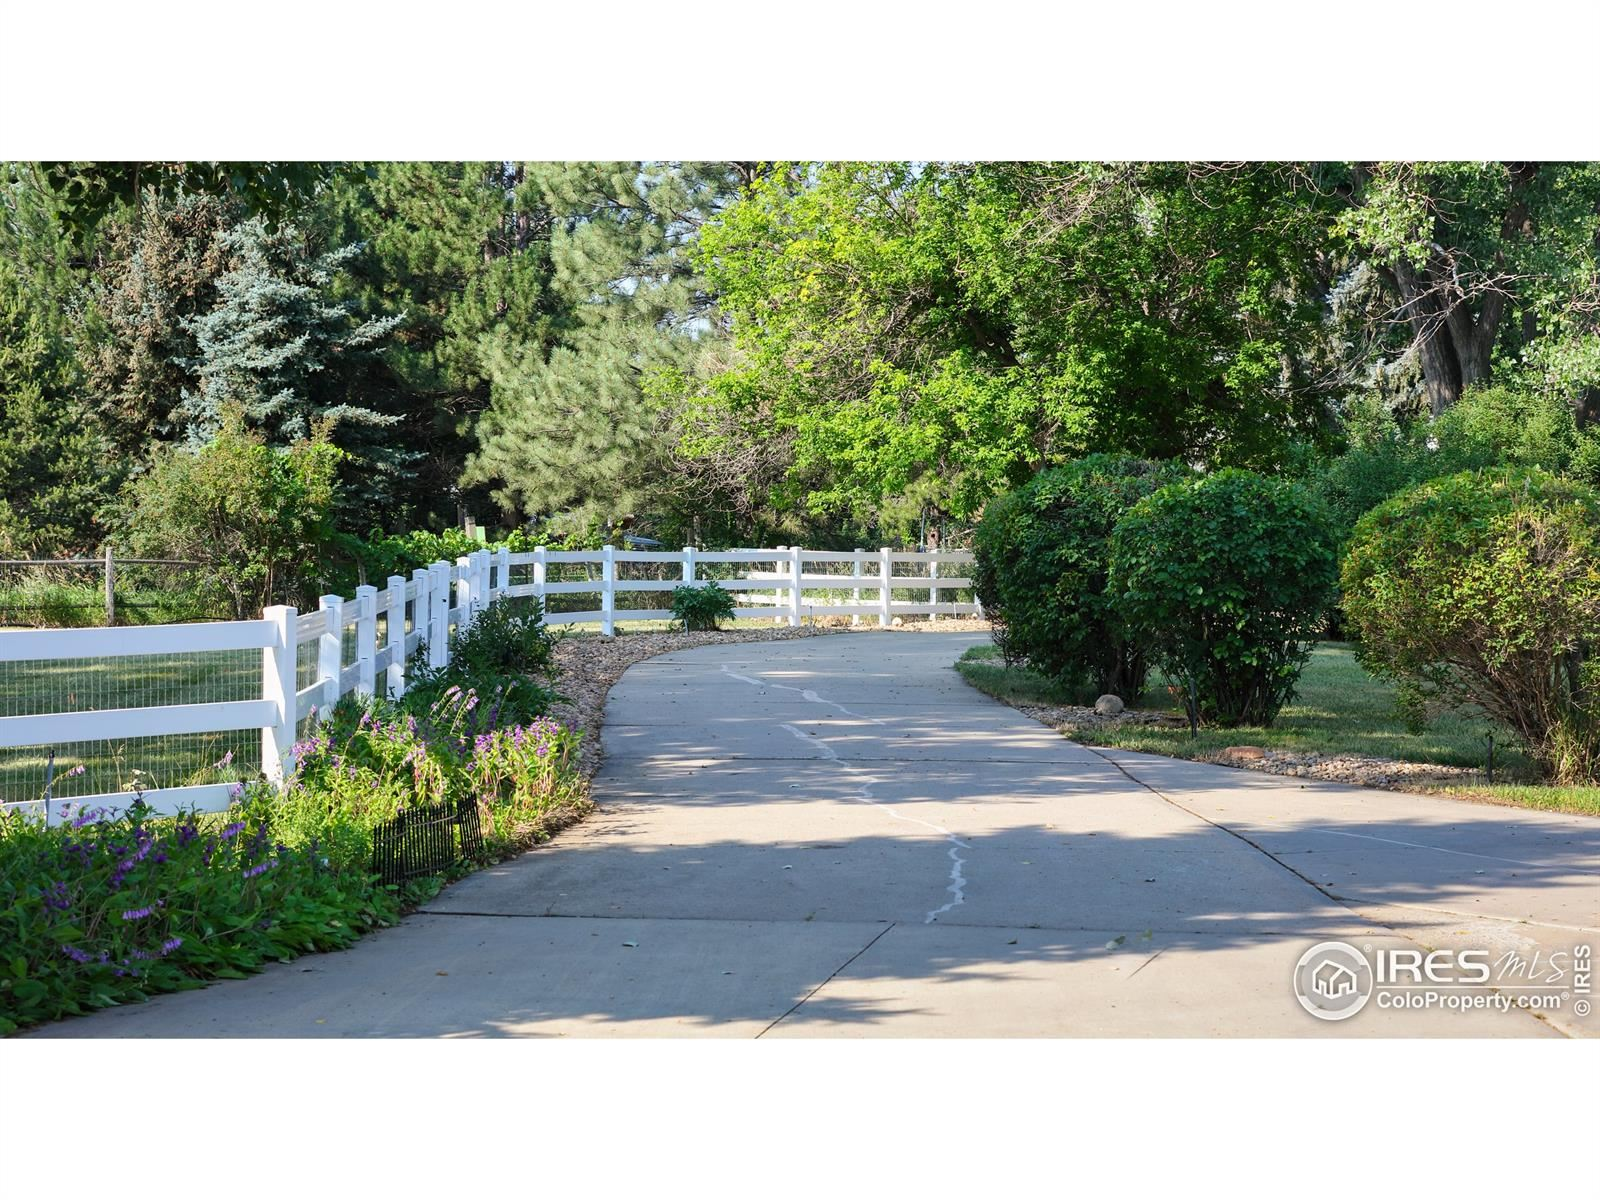 Photo of 9362 Tollgate Drive, Longmont, CO 80503 (MLS # IR947440)